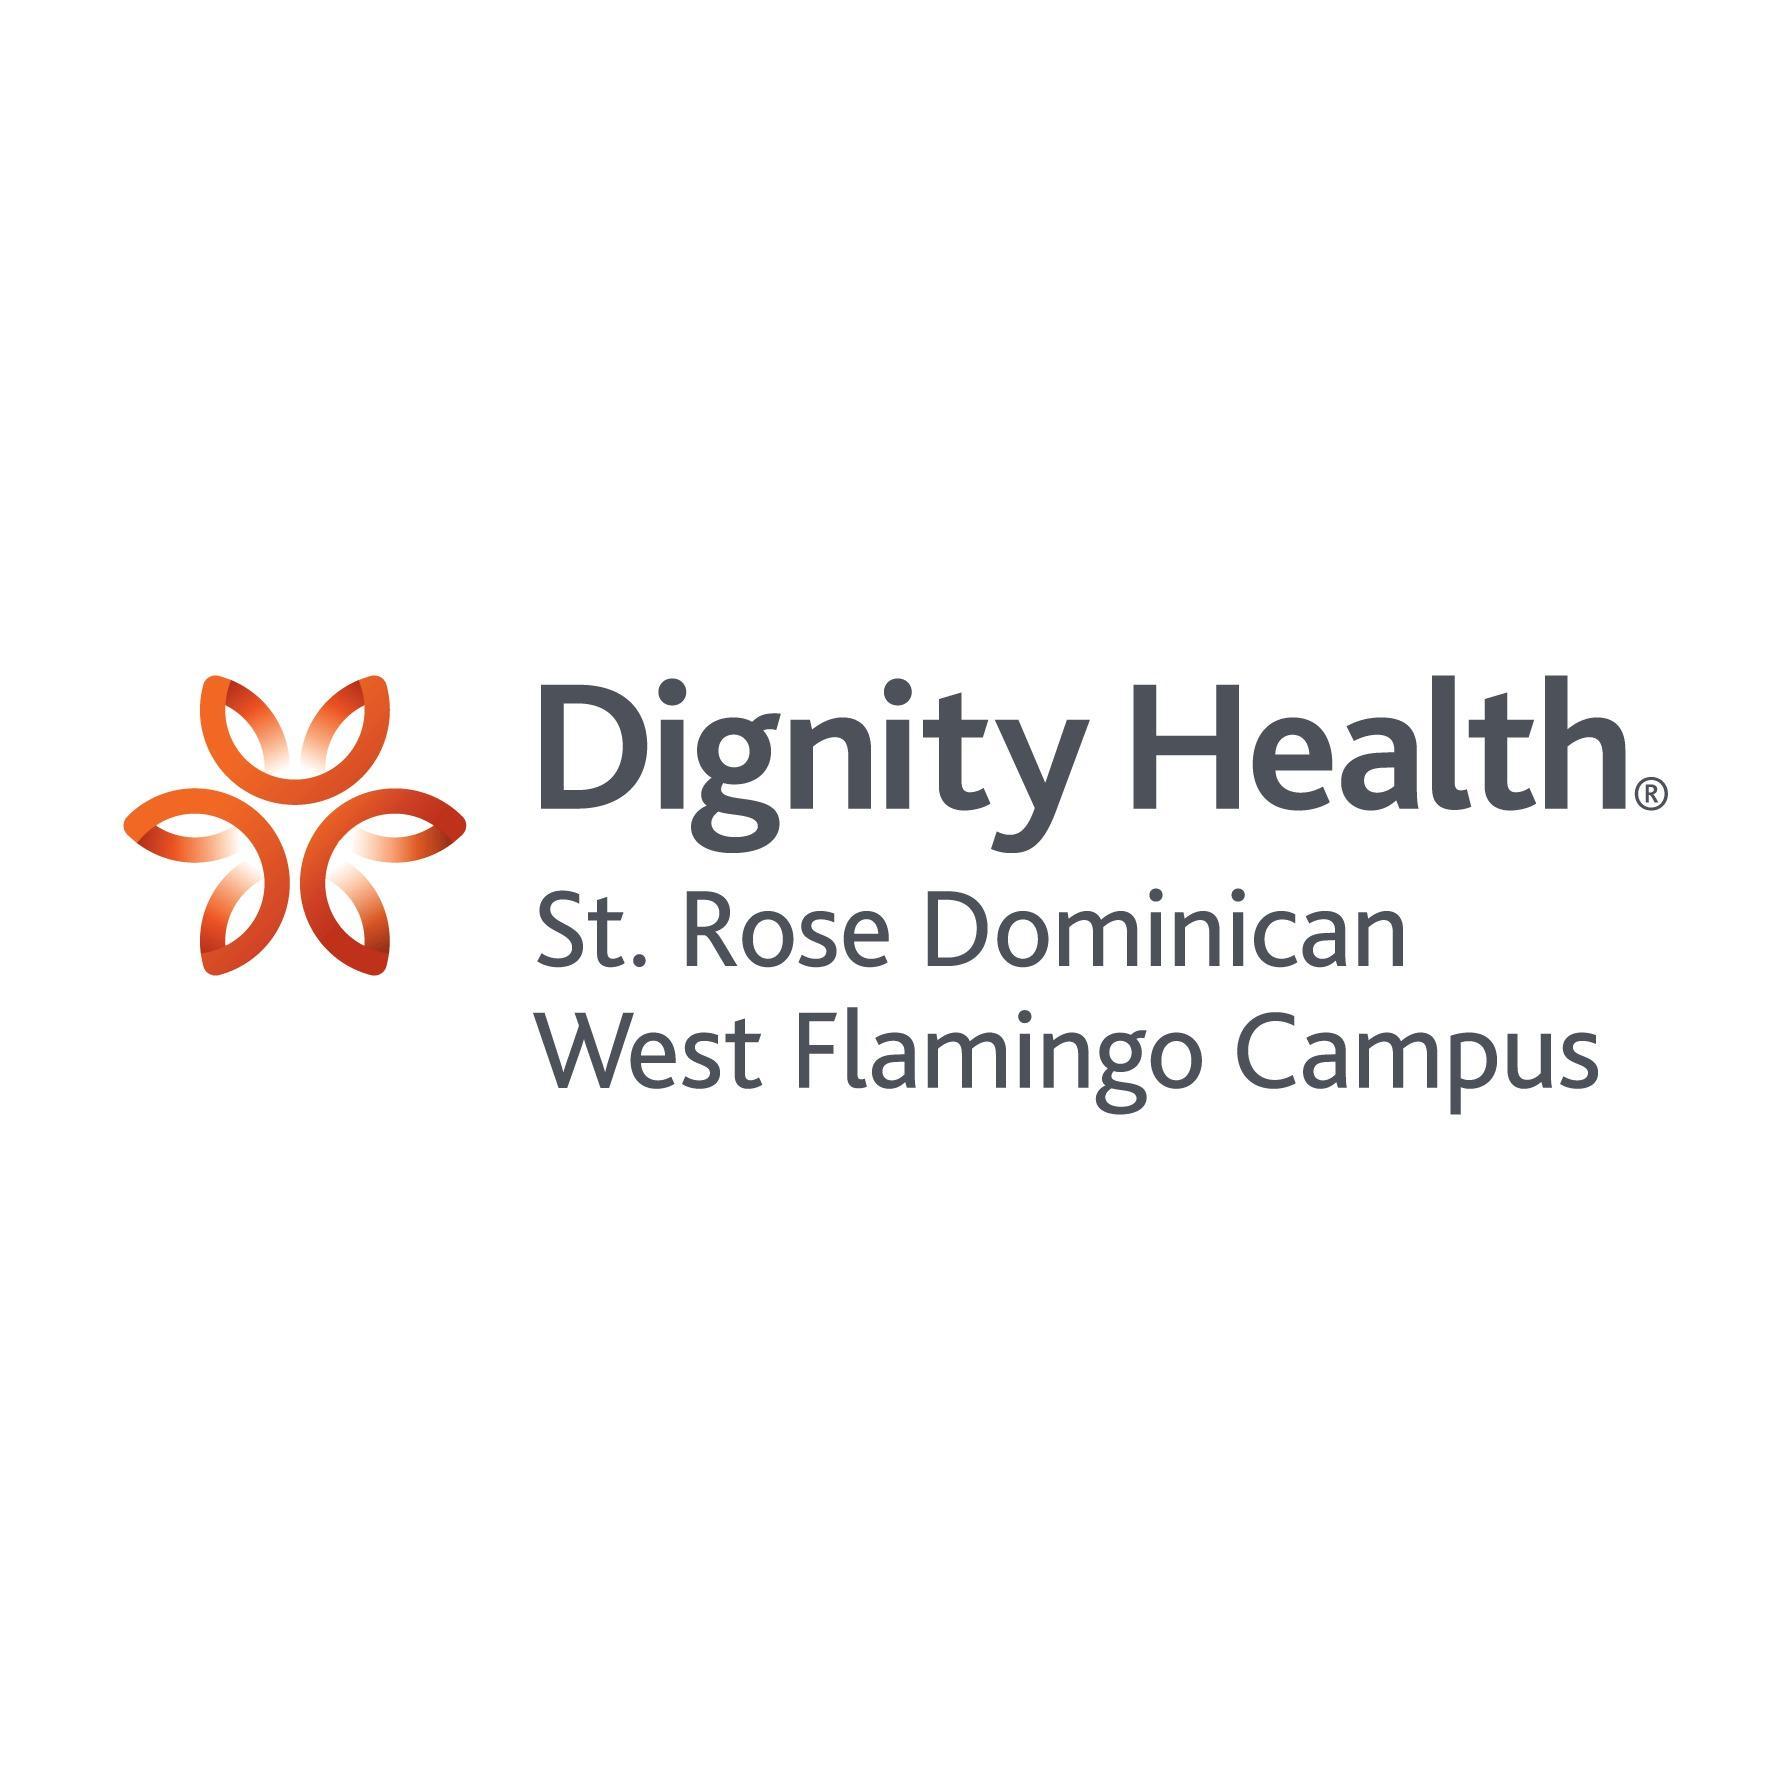 Dignity Health - St. Rose Dominican Hospital, West Flamingo - Las Vegas, NV